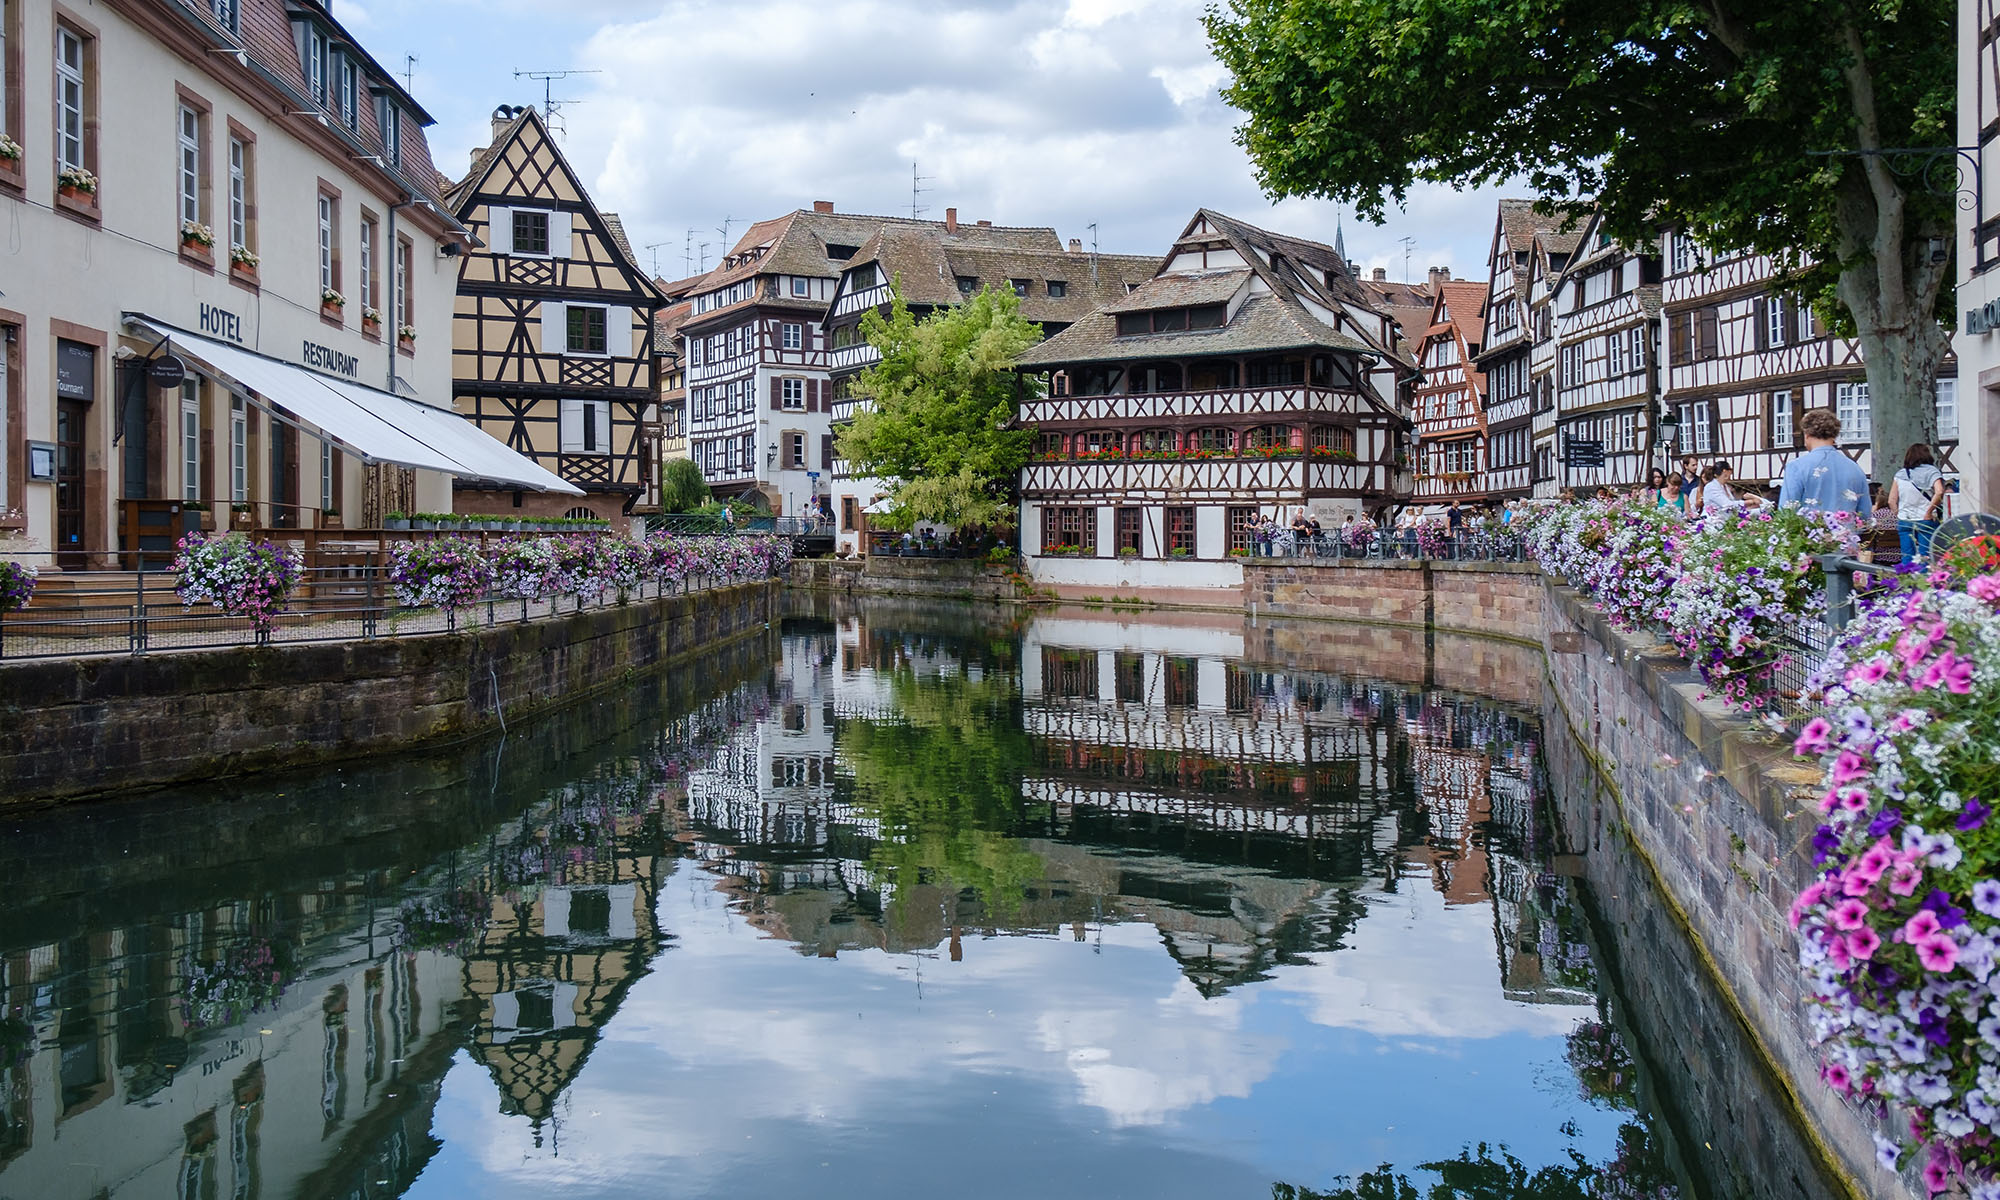 Historic buildings along a river in Strasbourg, France